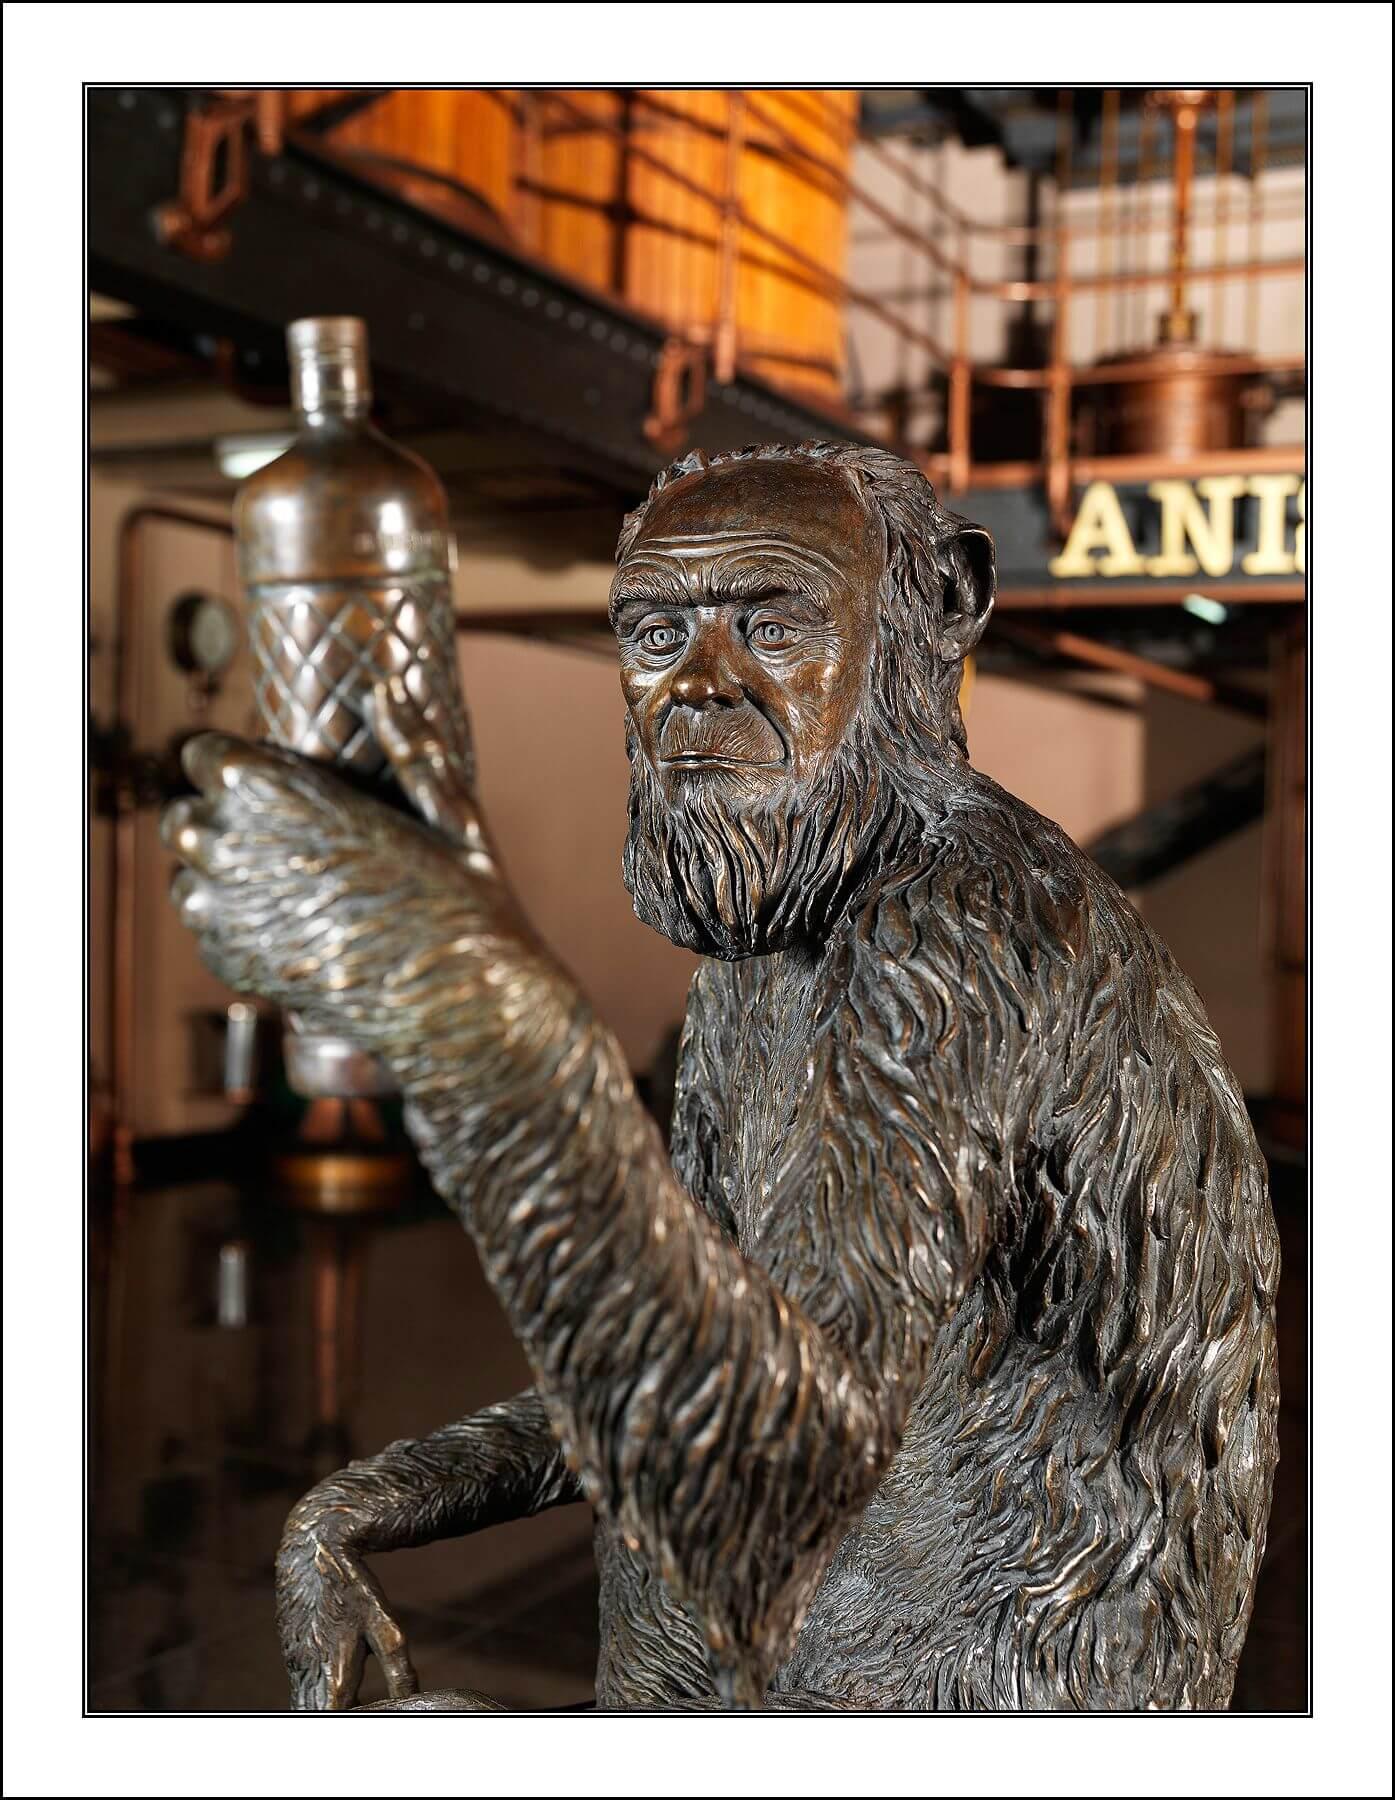 Estatua Anís del Mono en Badalona - 060712.jpg